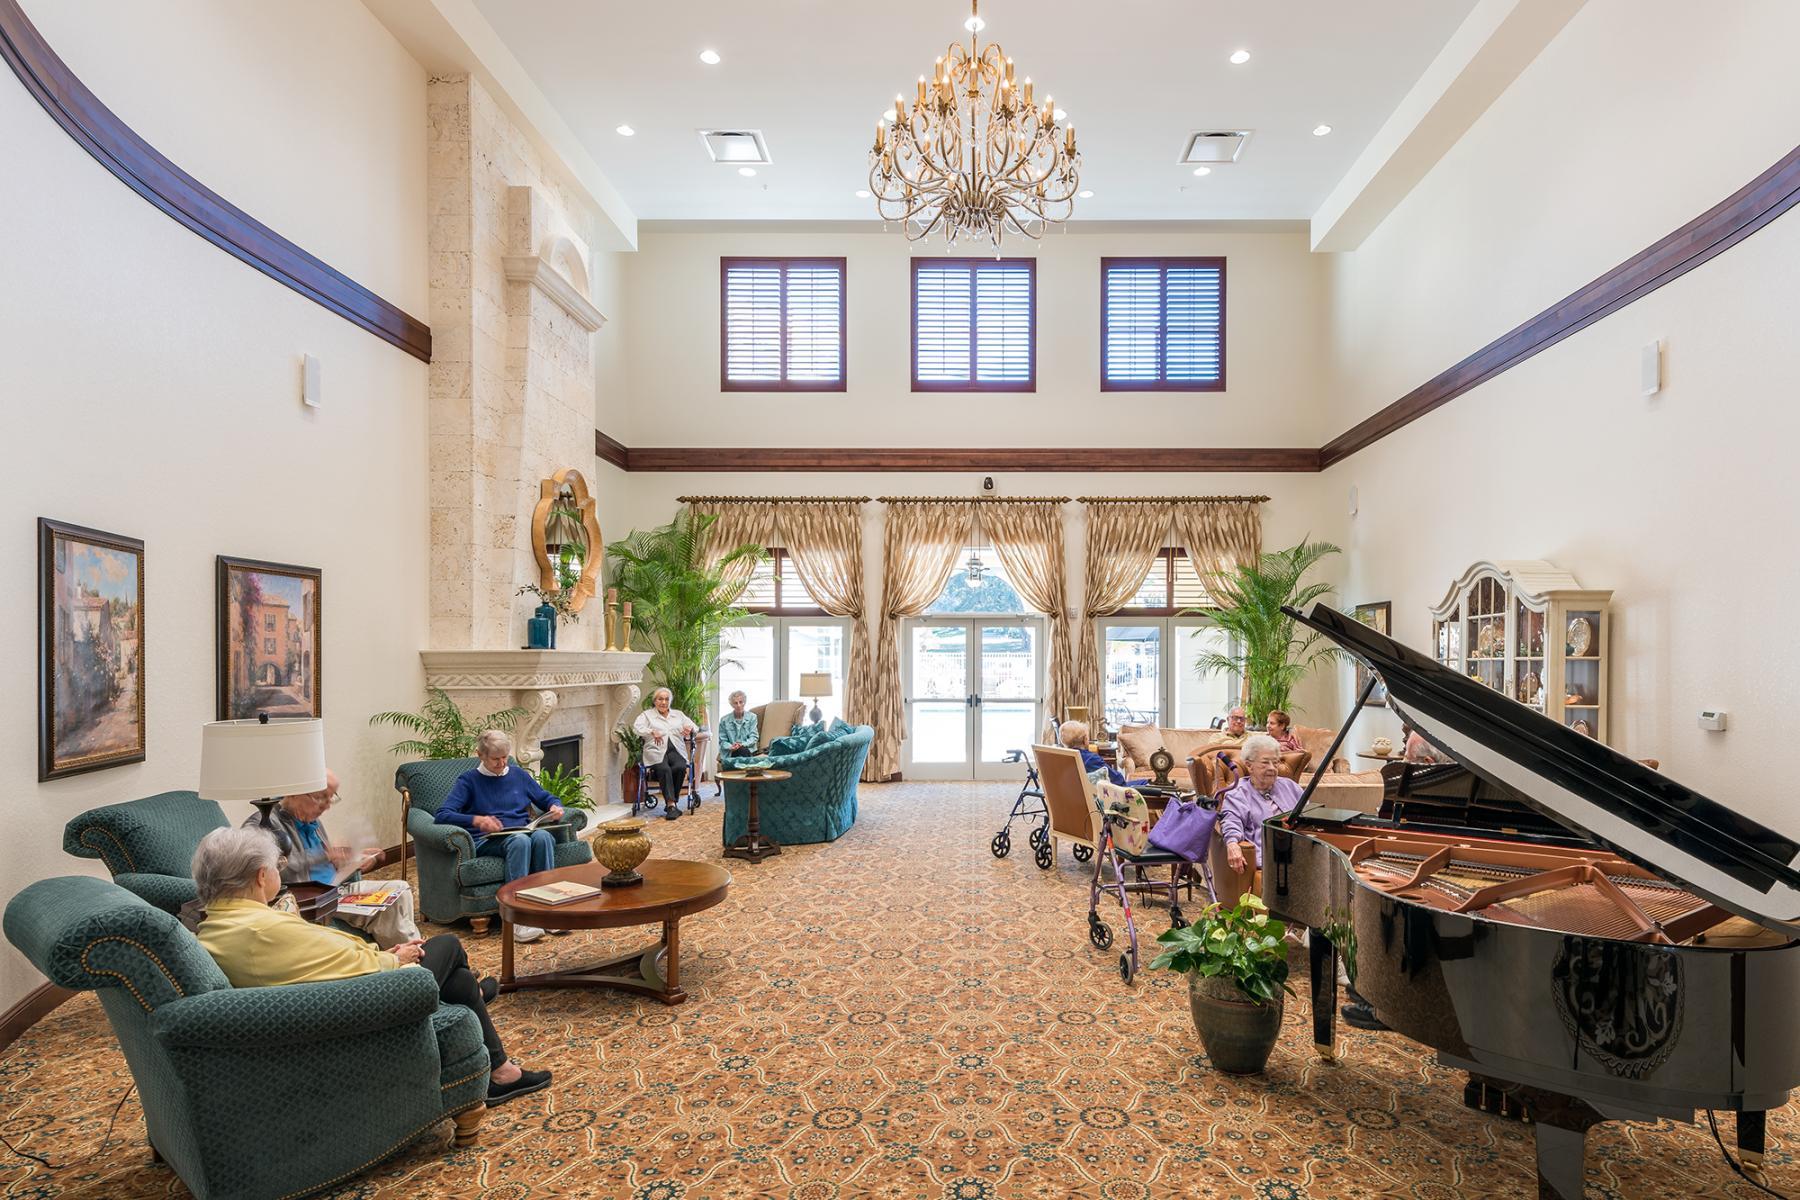 Grand Living : Grand Living at Citrus Hills  Ryan Companies